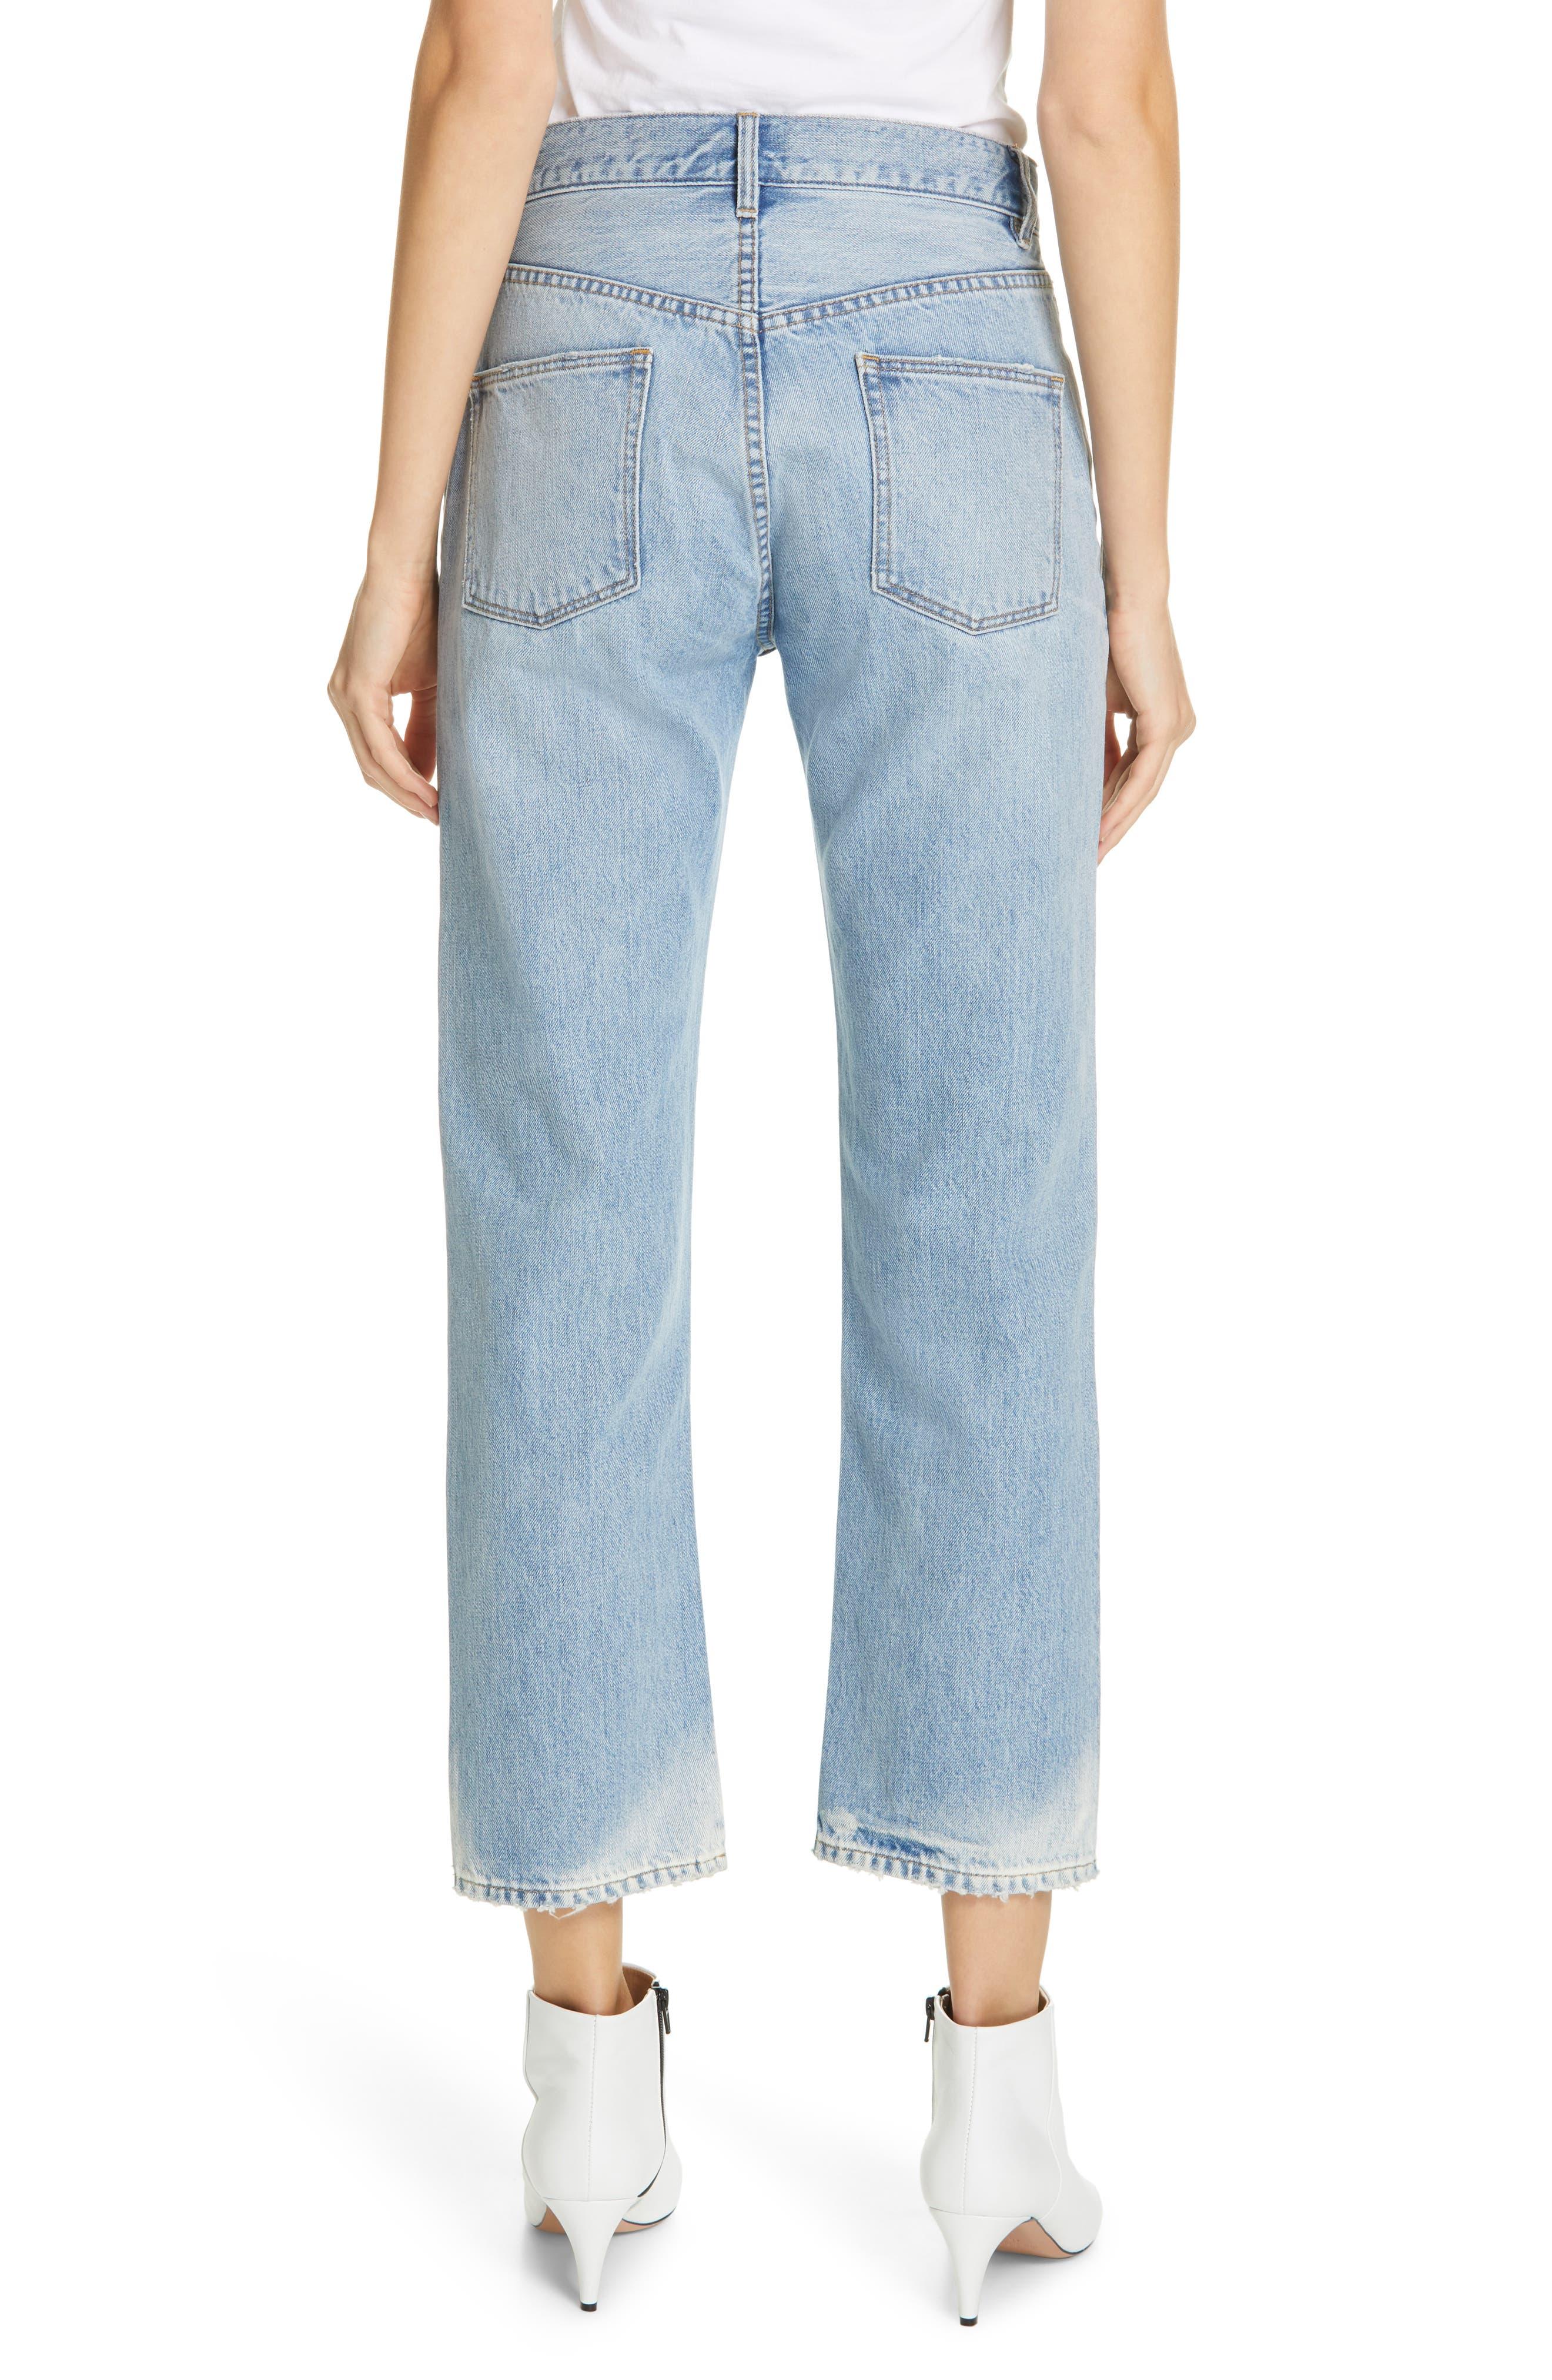 LA VIE REBECCA TAYLOR, Sylvie High Waist Jeans, Alternate thumbnail 2, color, CHANTAL WASH